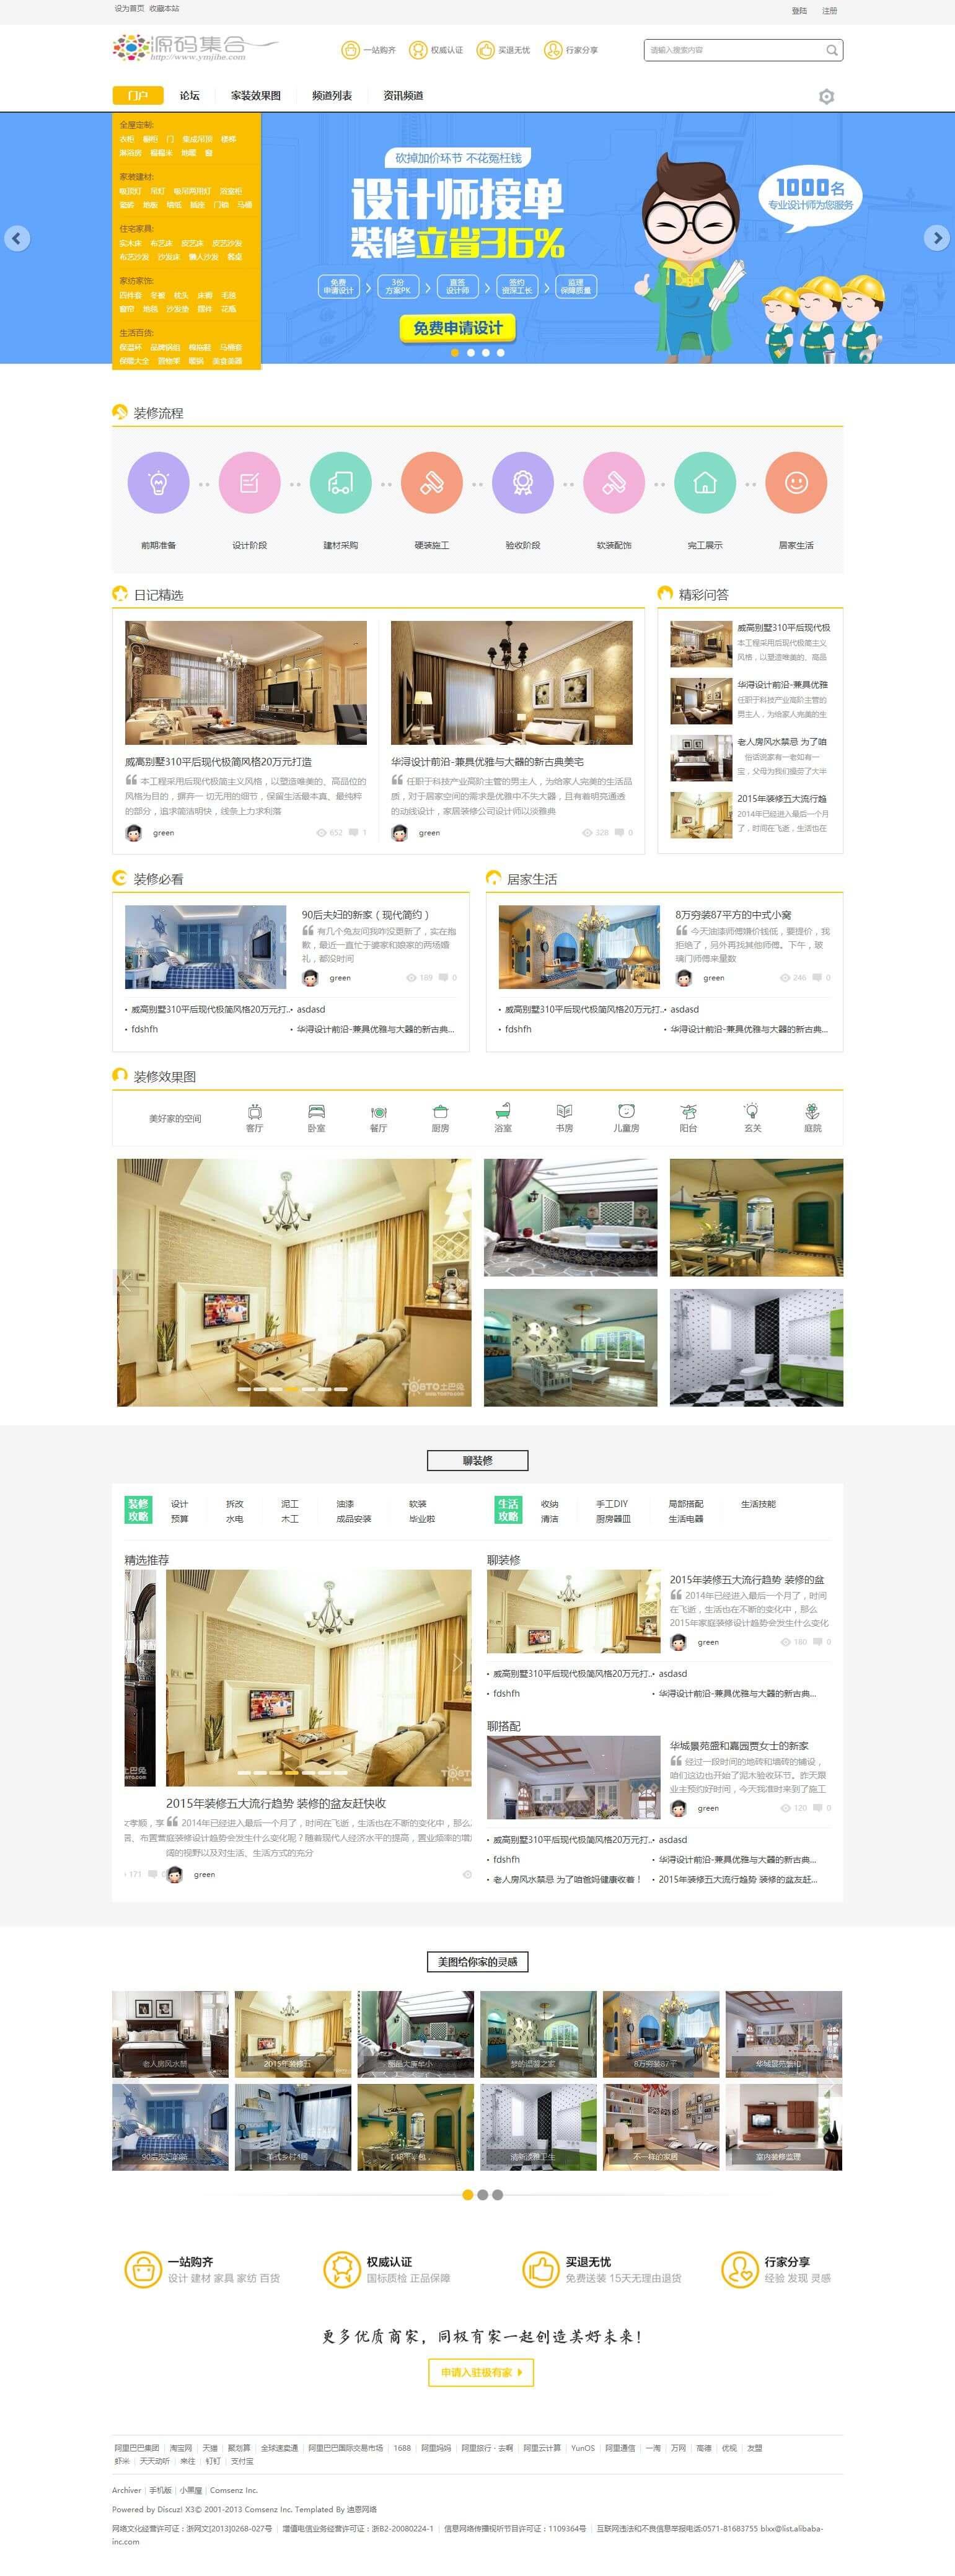 Discuz仿迪恩Deco风格模板,家居装修商业版整站带演示数据